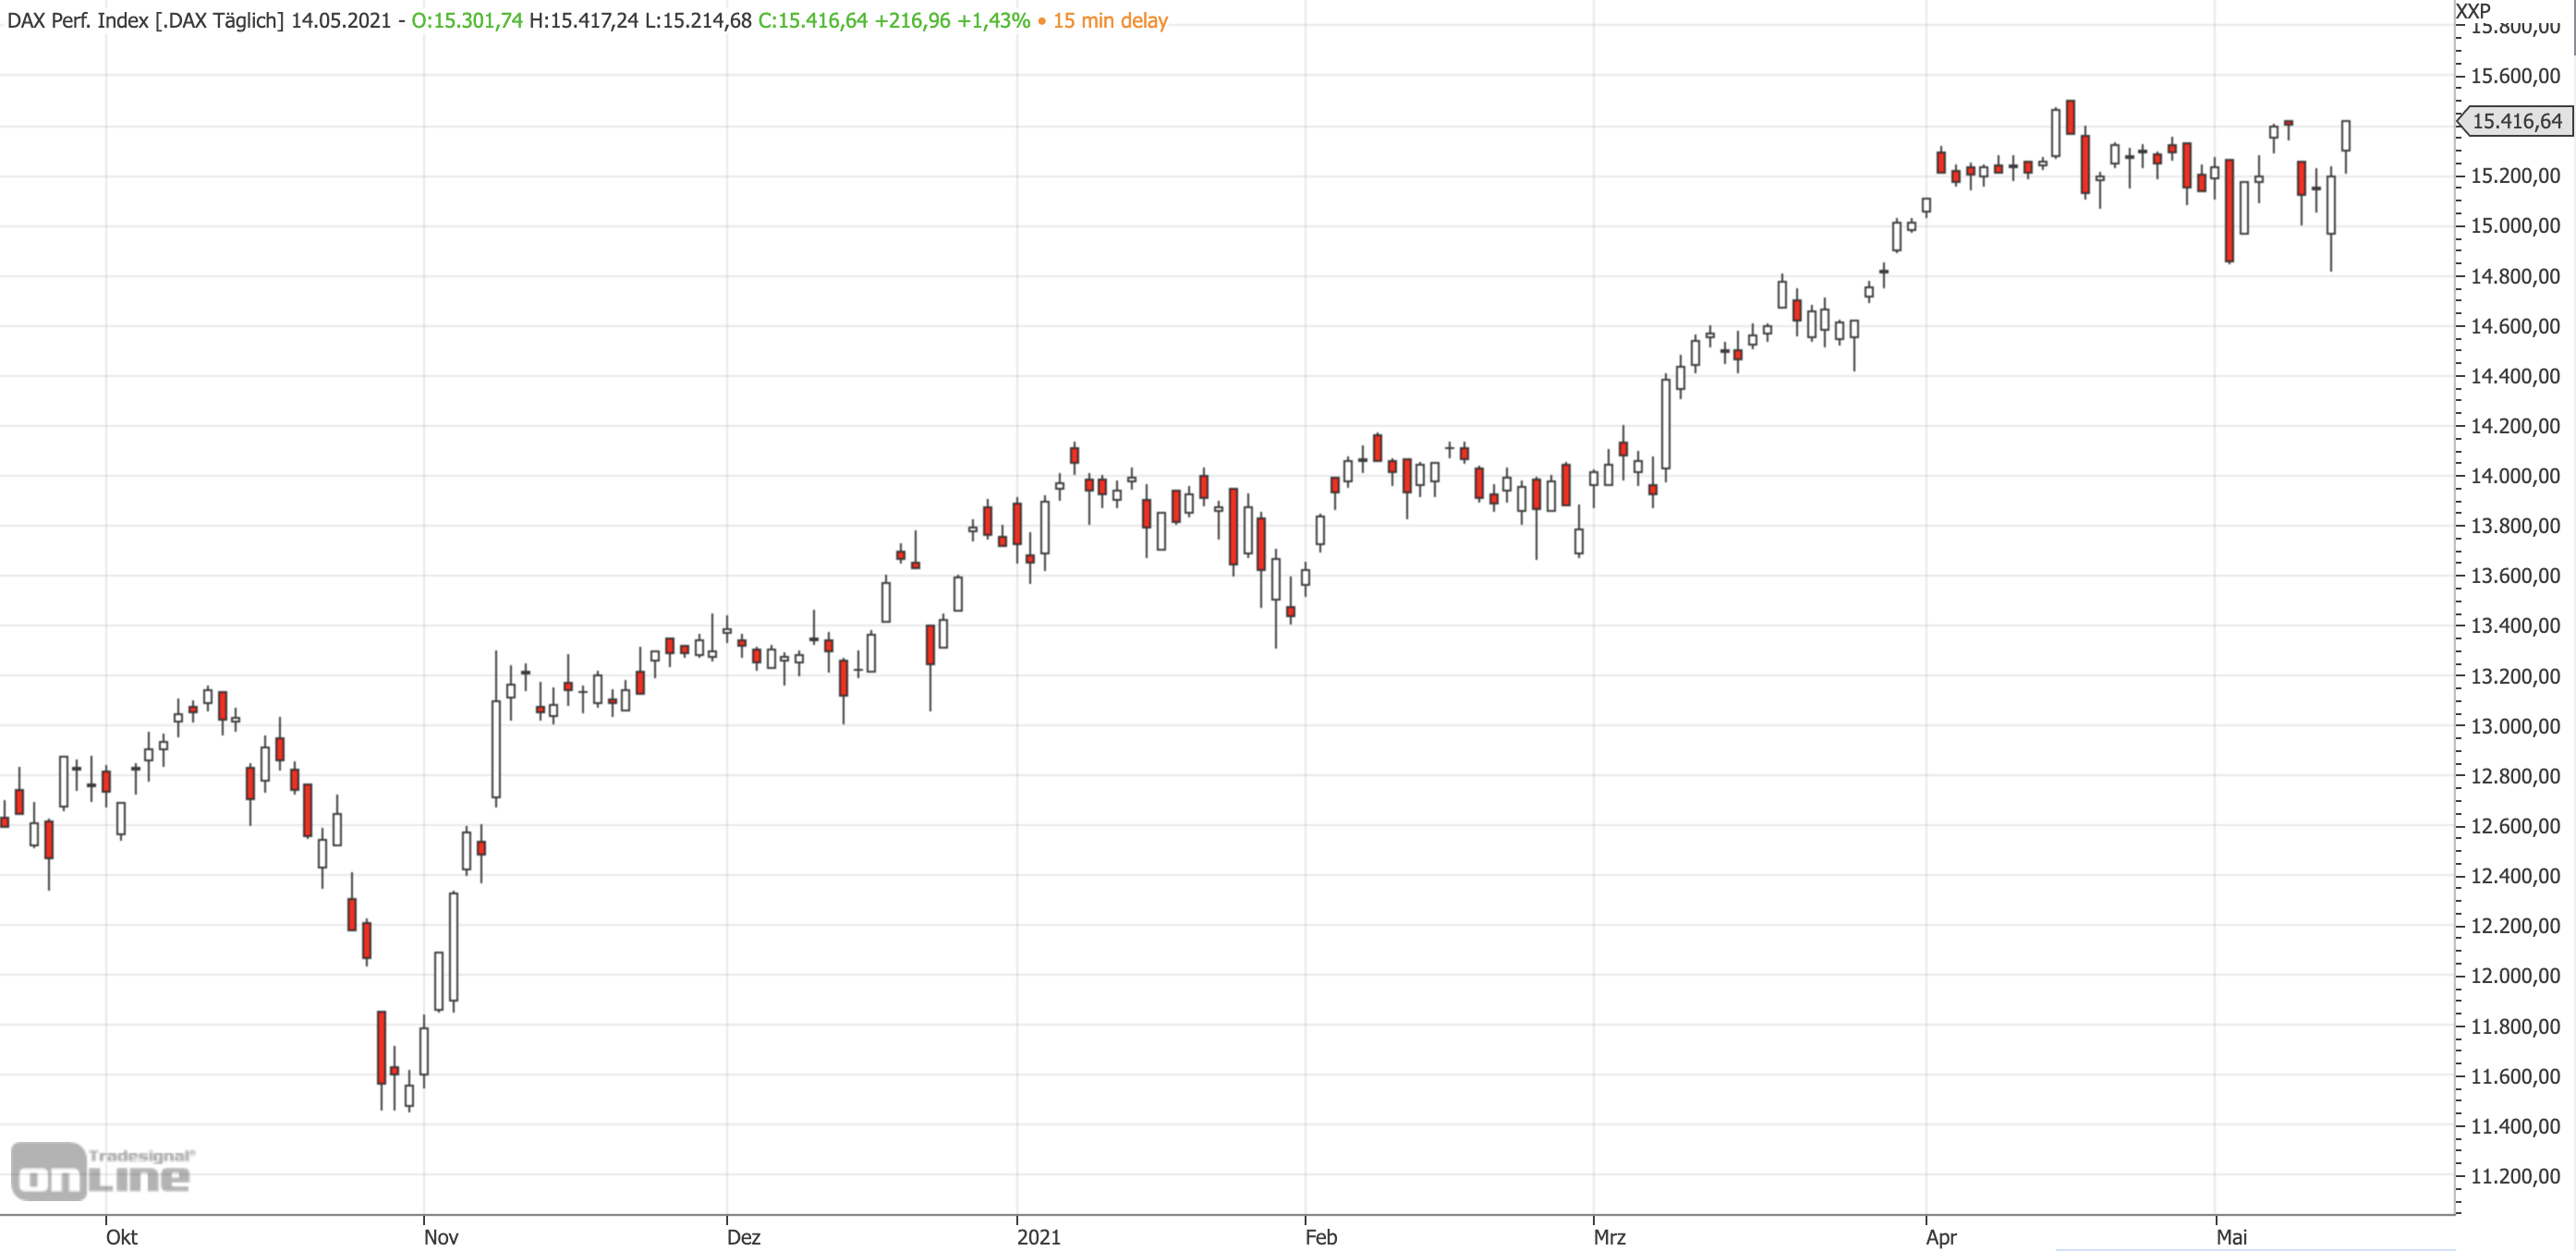 Mittelfristiger DAX-Chart am 14.05.2021